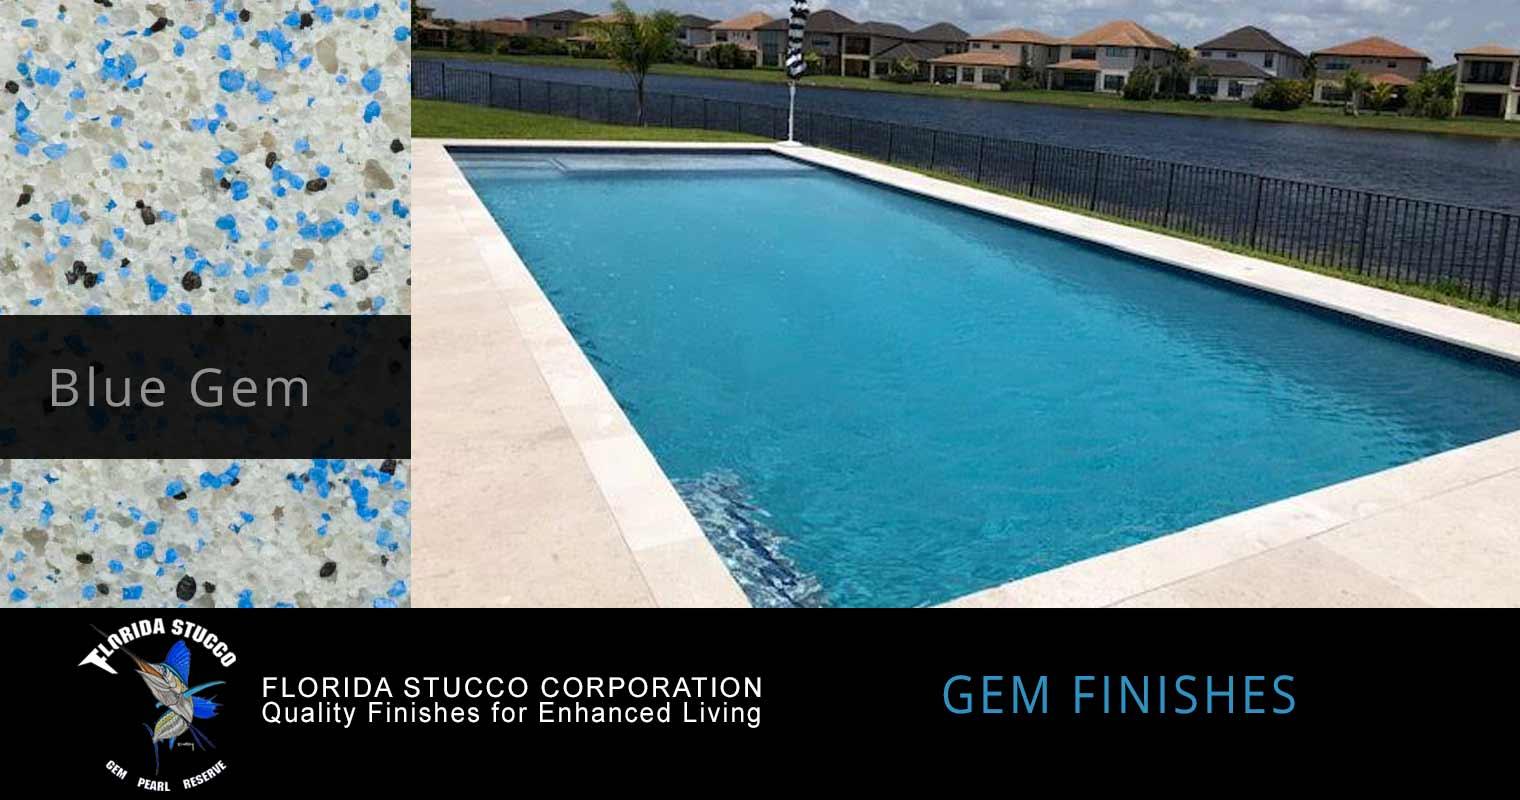 Florida Stucco - Blue Gem Plastering Finish Pool Sample 1